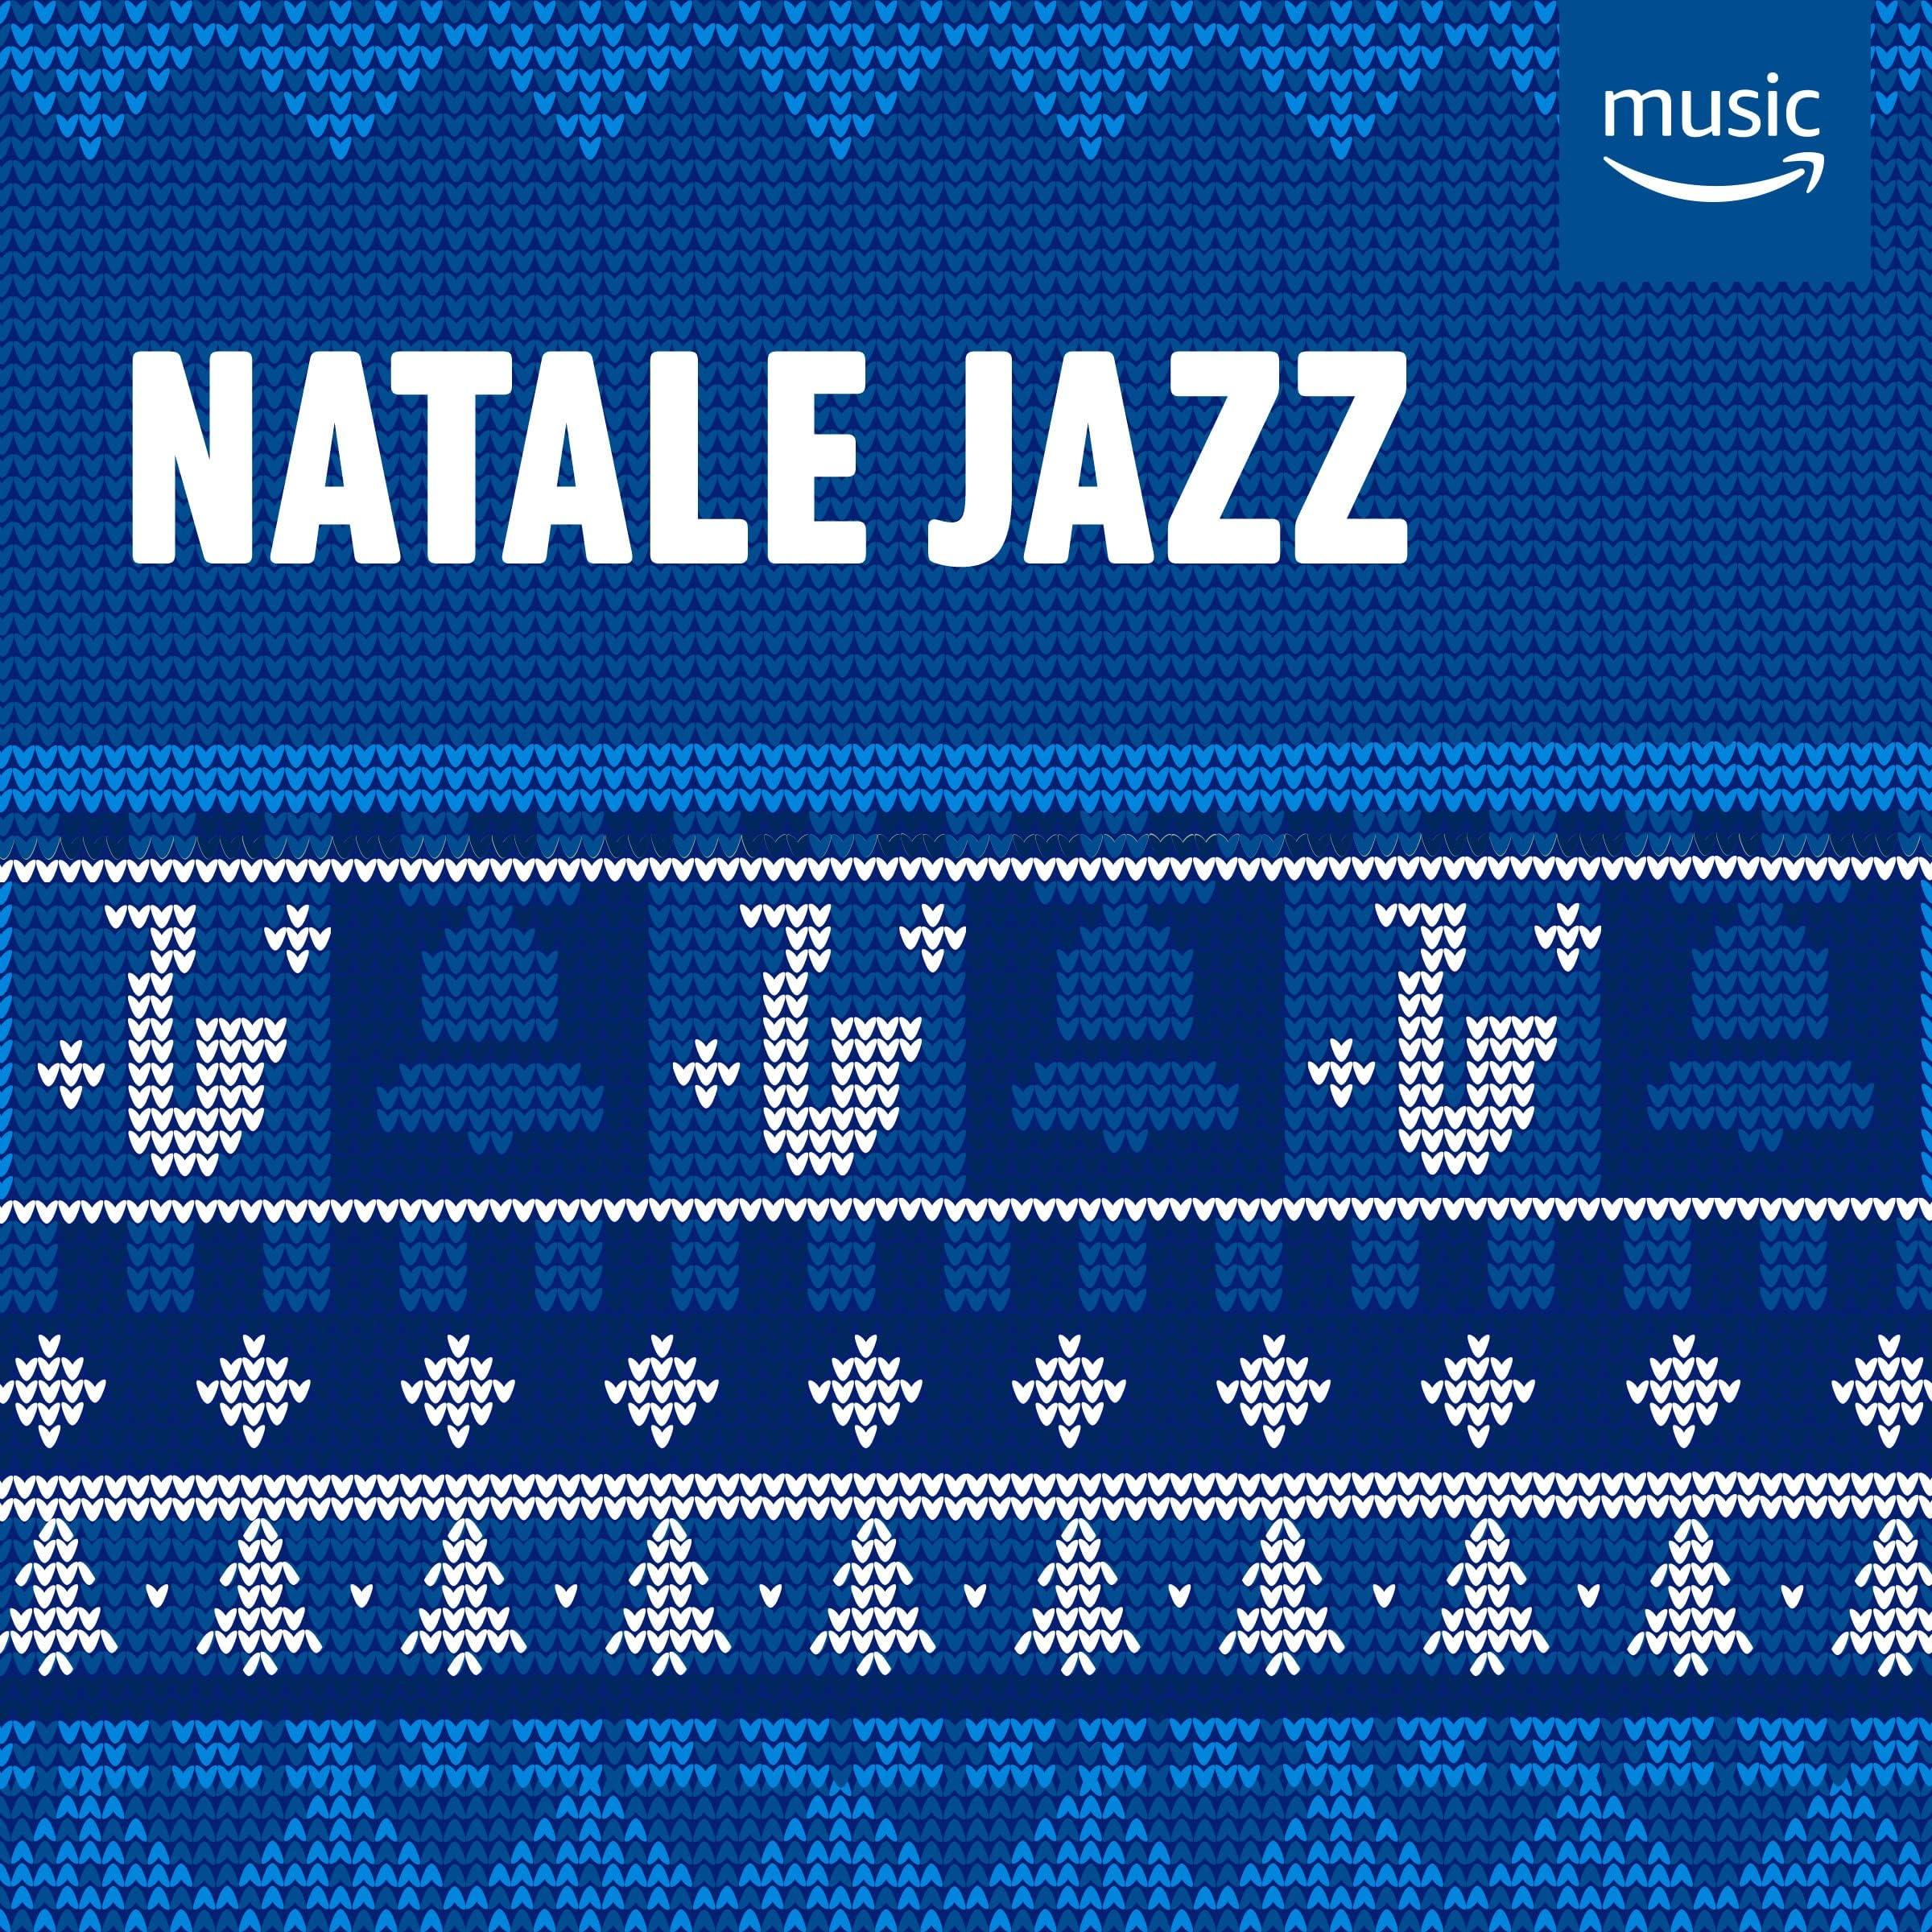 Natale Jazz